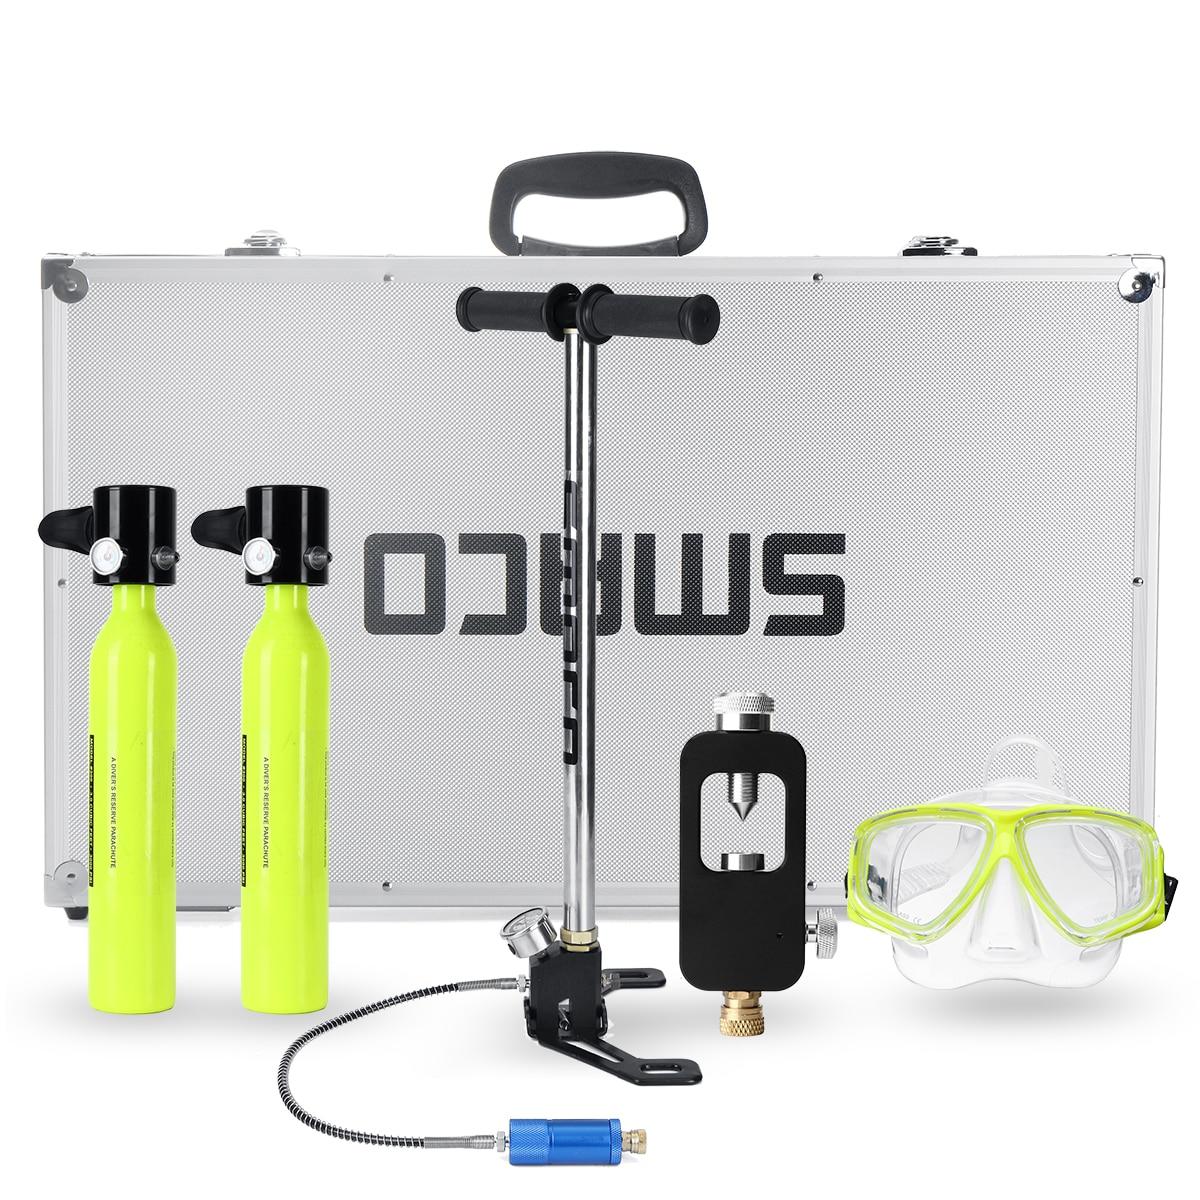 6 In 1 Diving System Mini Scuba Cylinder Scuba Oxygen Reserve Air Tank Pump Aluminum Box Snorkeling Diving Equipment Set